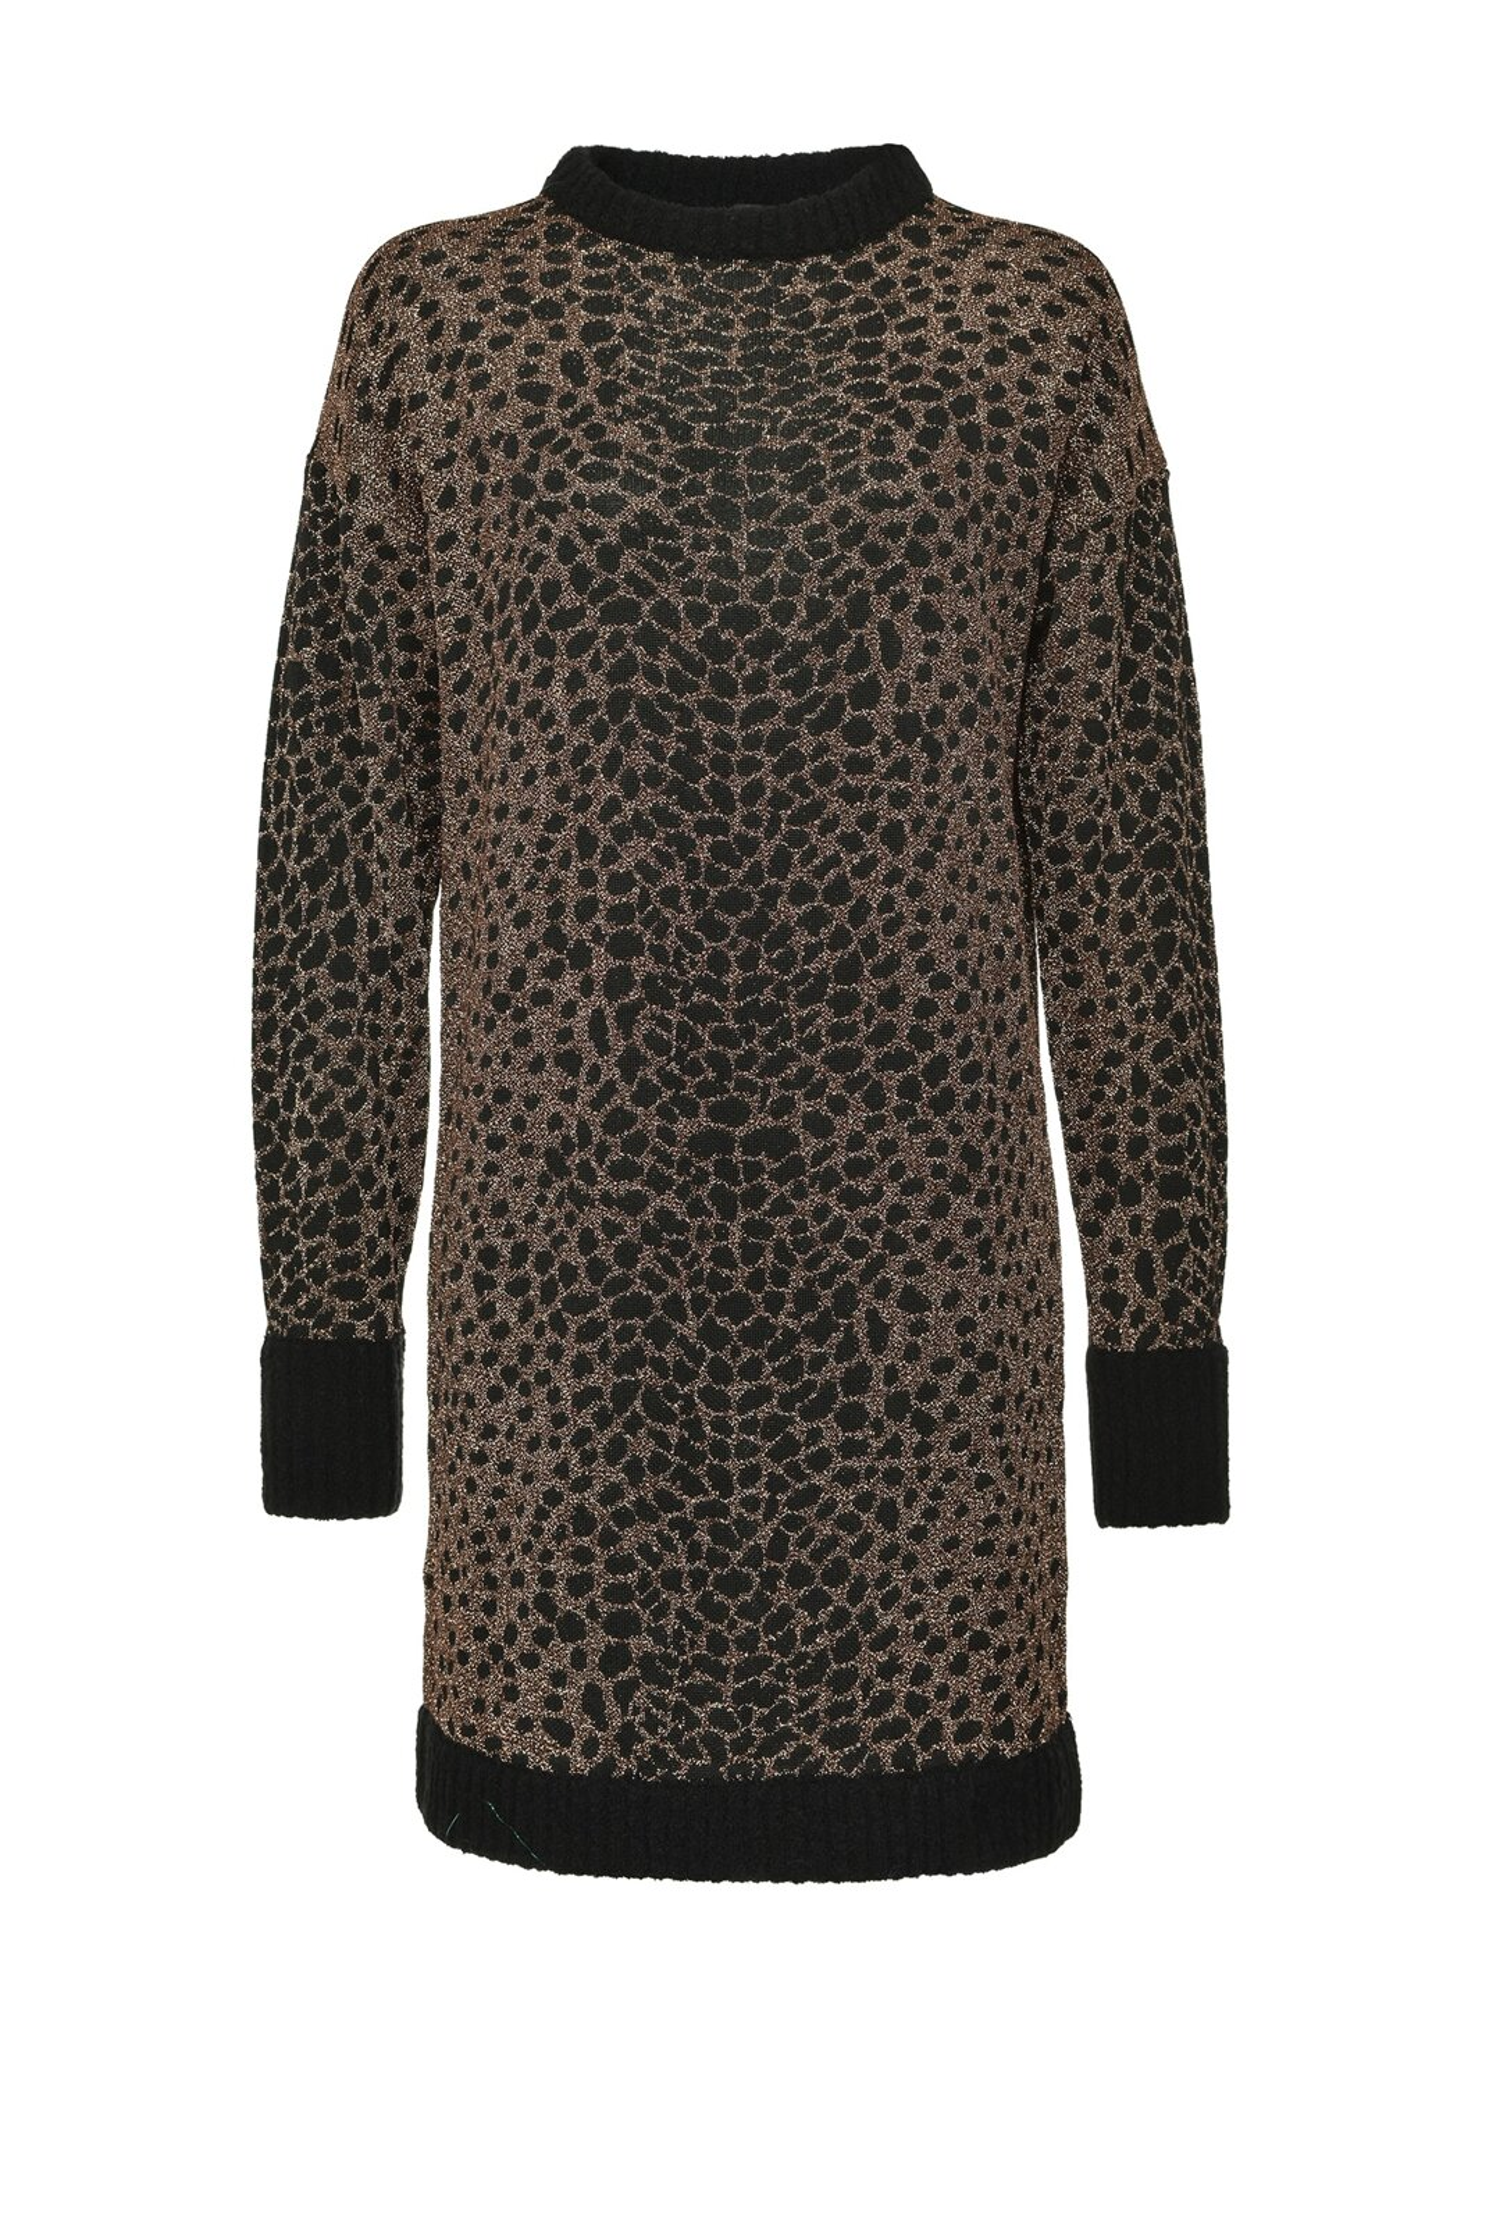 Ocelot Jacquard Lurex Knit Dress - Pinko